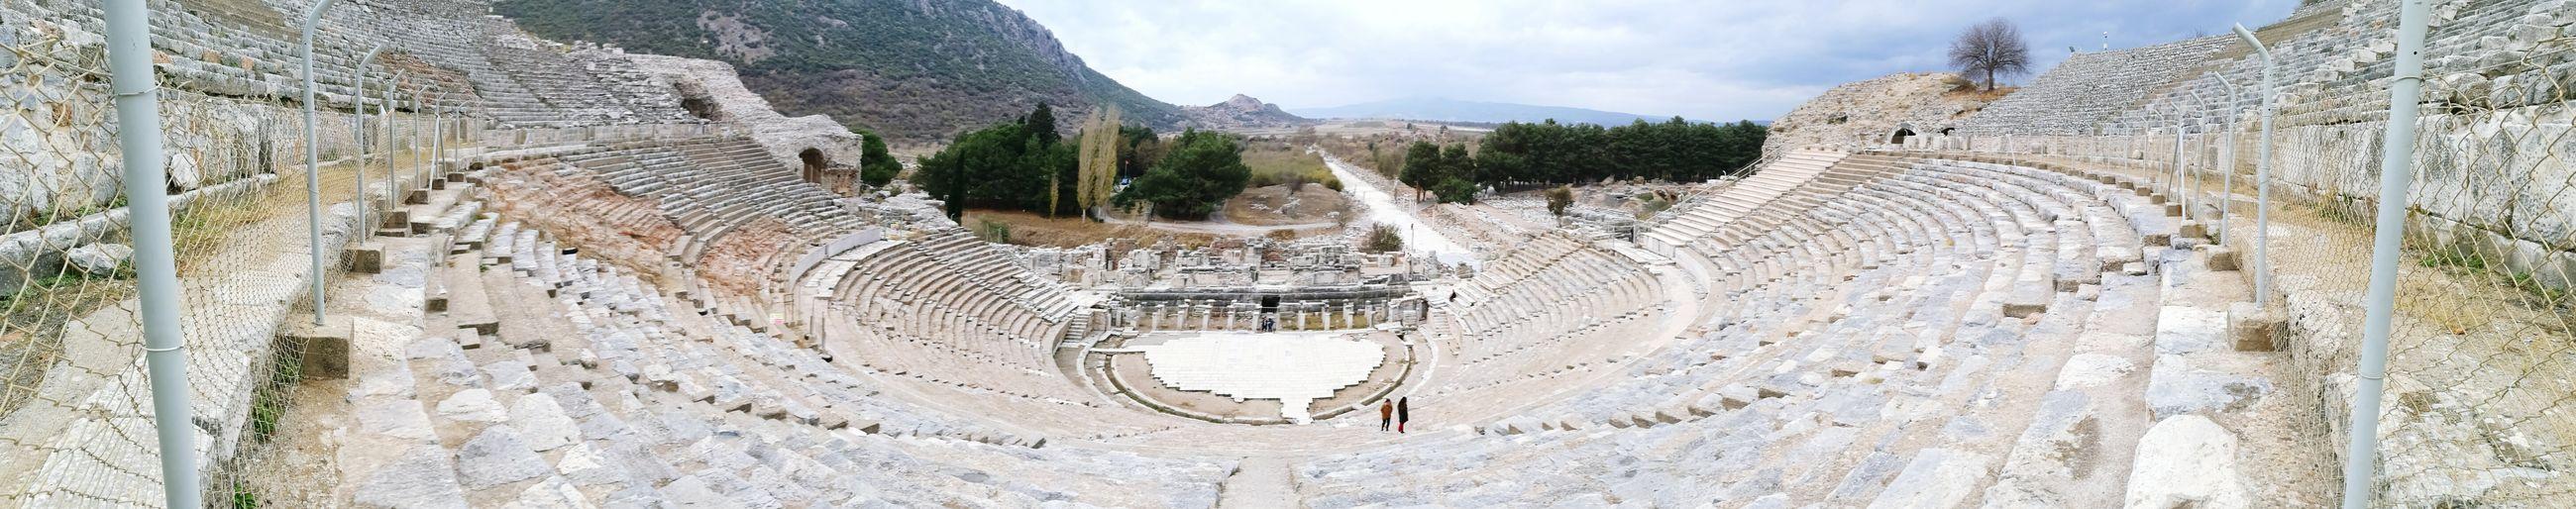 Ephesustheater Ephesus Ruins Ephesus Wonderful View Helenistik Greek History Ephesus - Turkey Exciting Turkey Roman History Architecture Amazing View